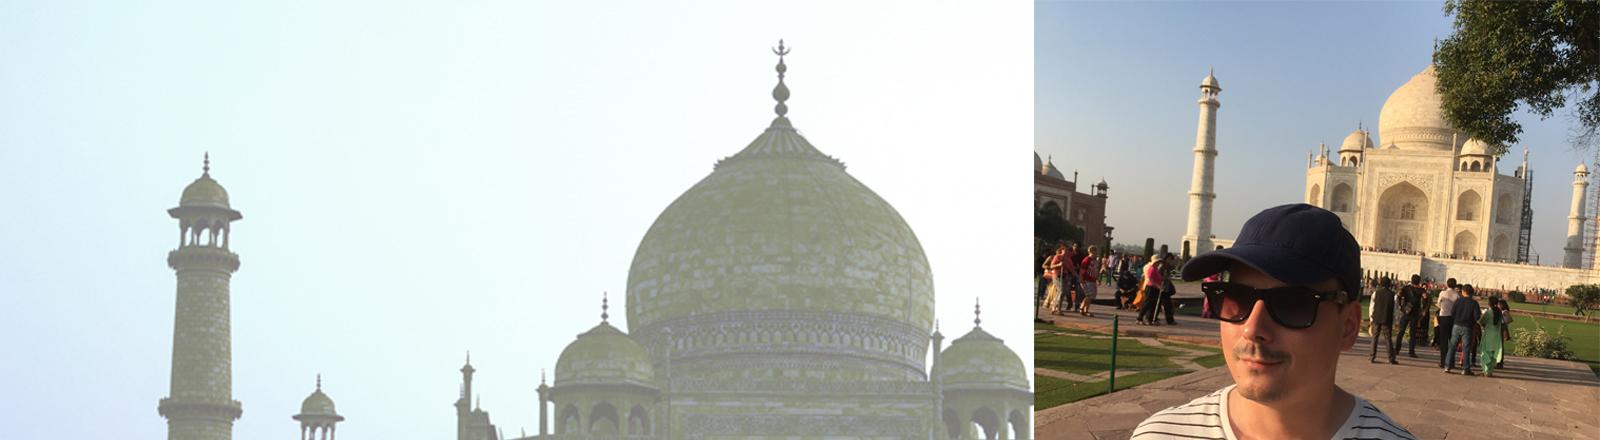 Marcel Franke am Taj Mahal